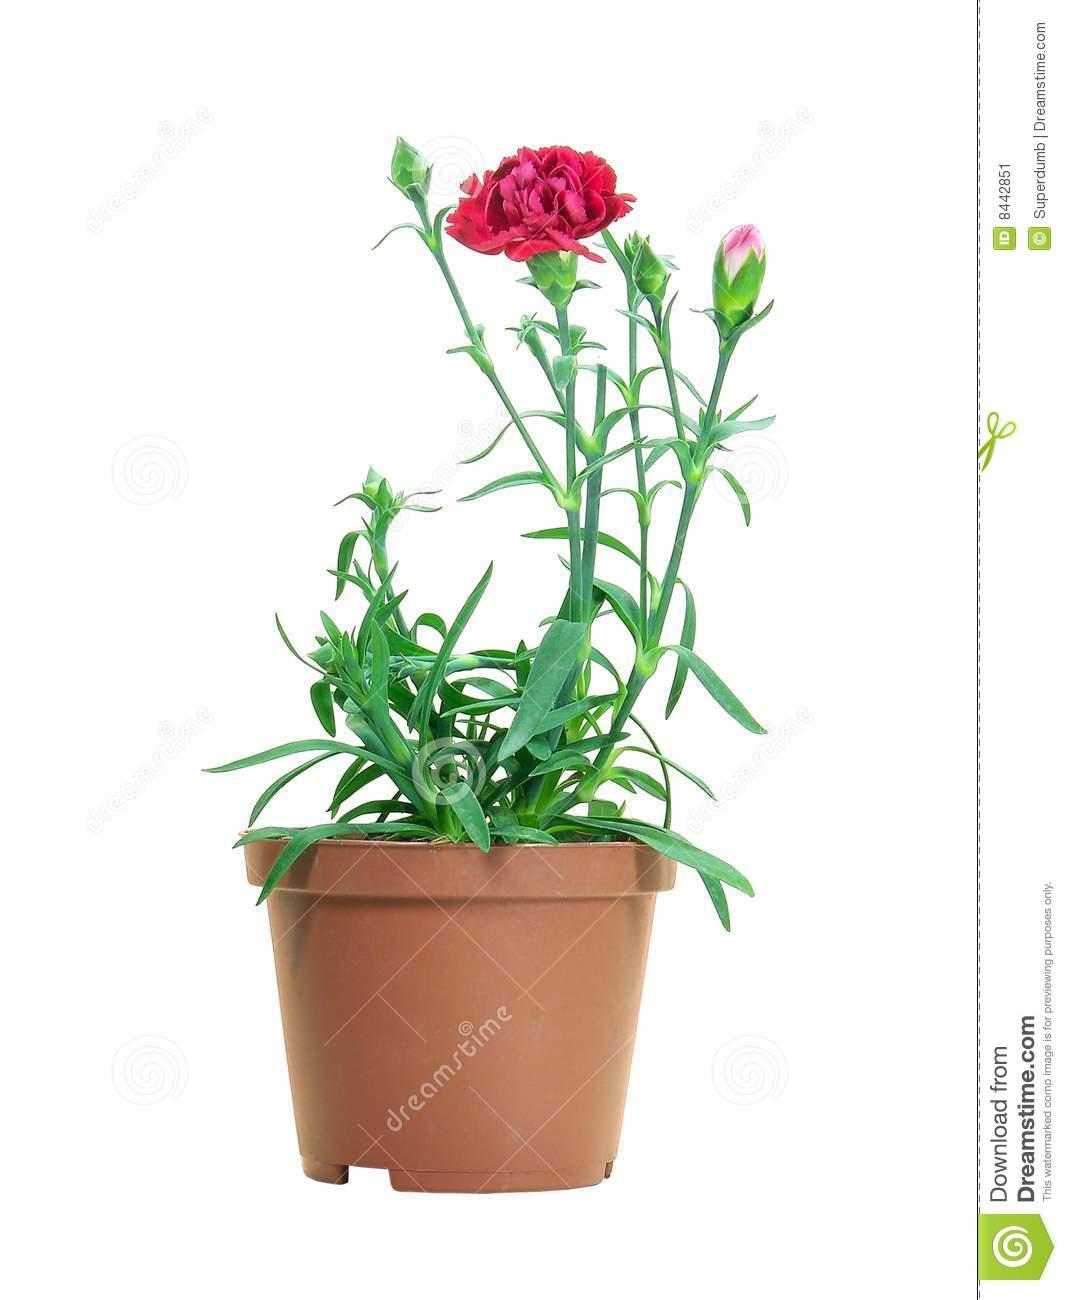 Dianthus Caryophyllus Stock Image.